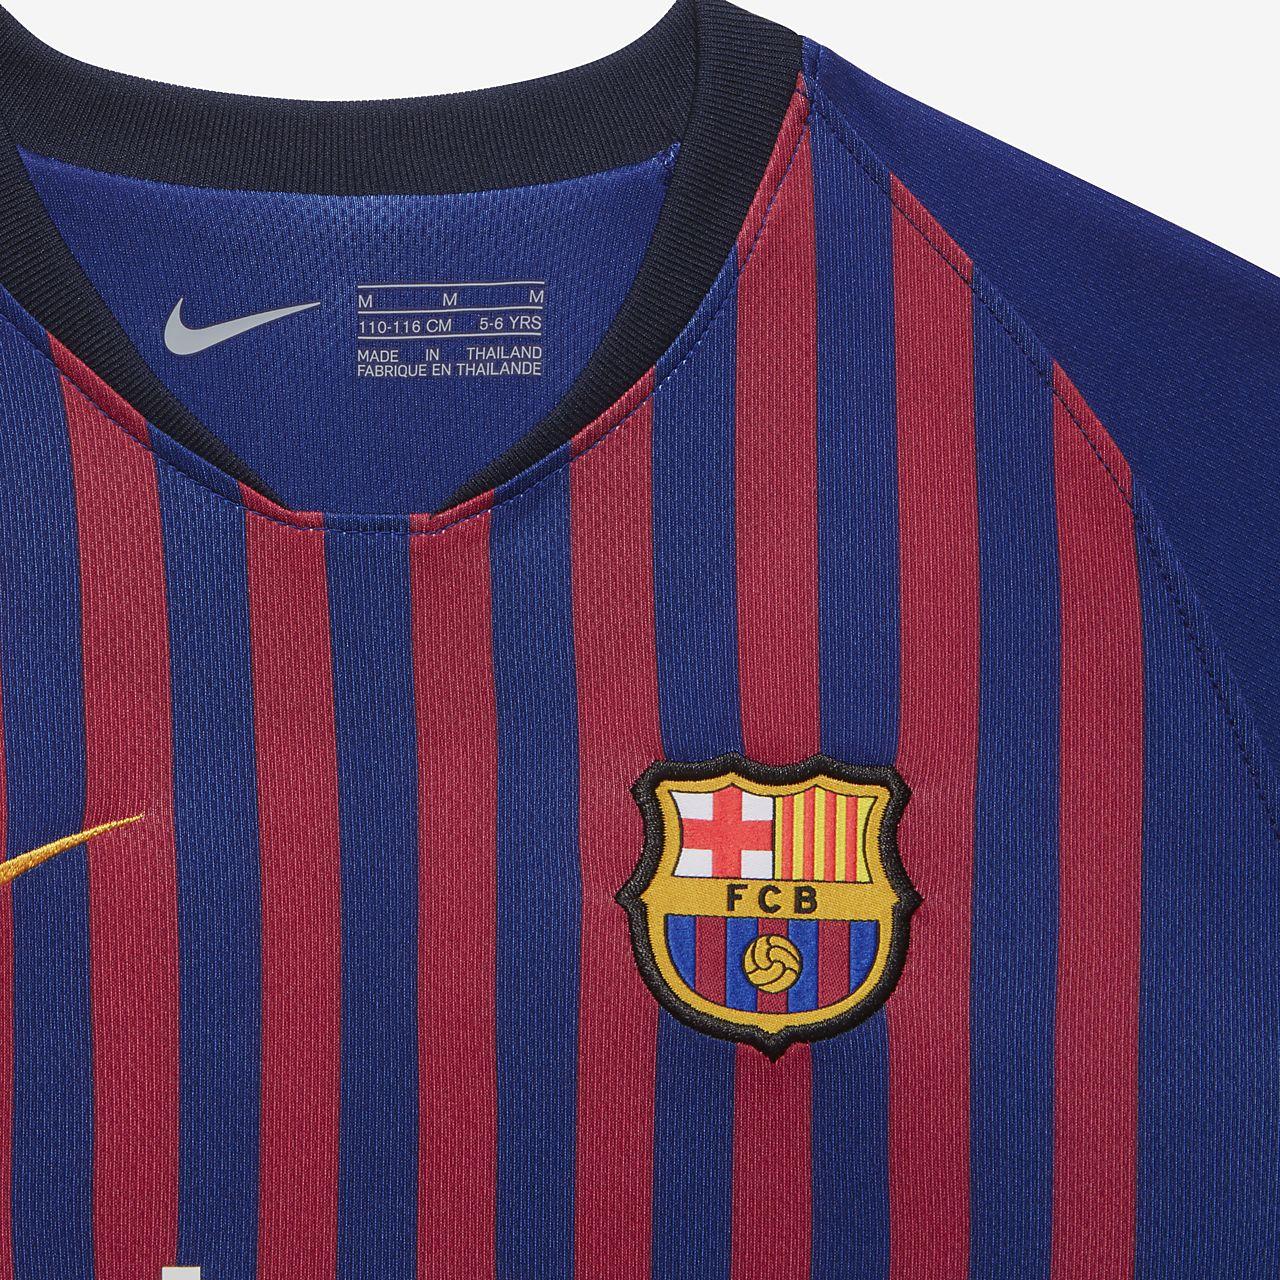 4ffec22d10ff97 ... 2018 19 FC Barcelona Stadium Home Fußballtrikot-Set für jüngere Kinder